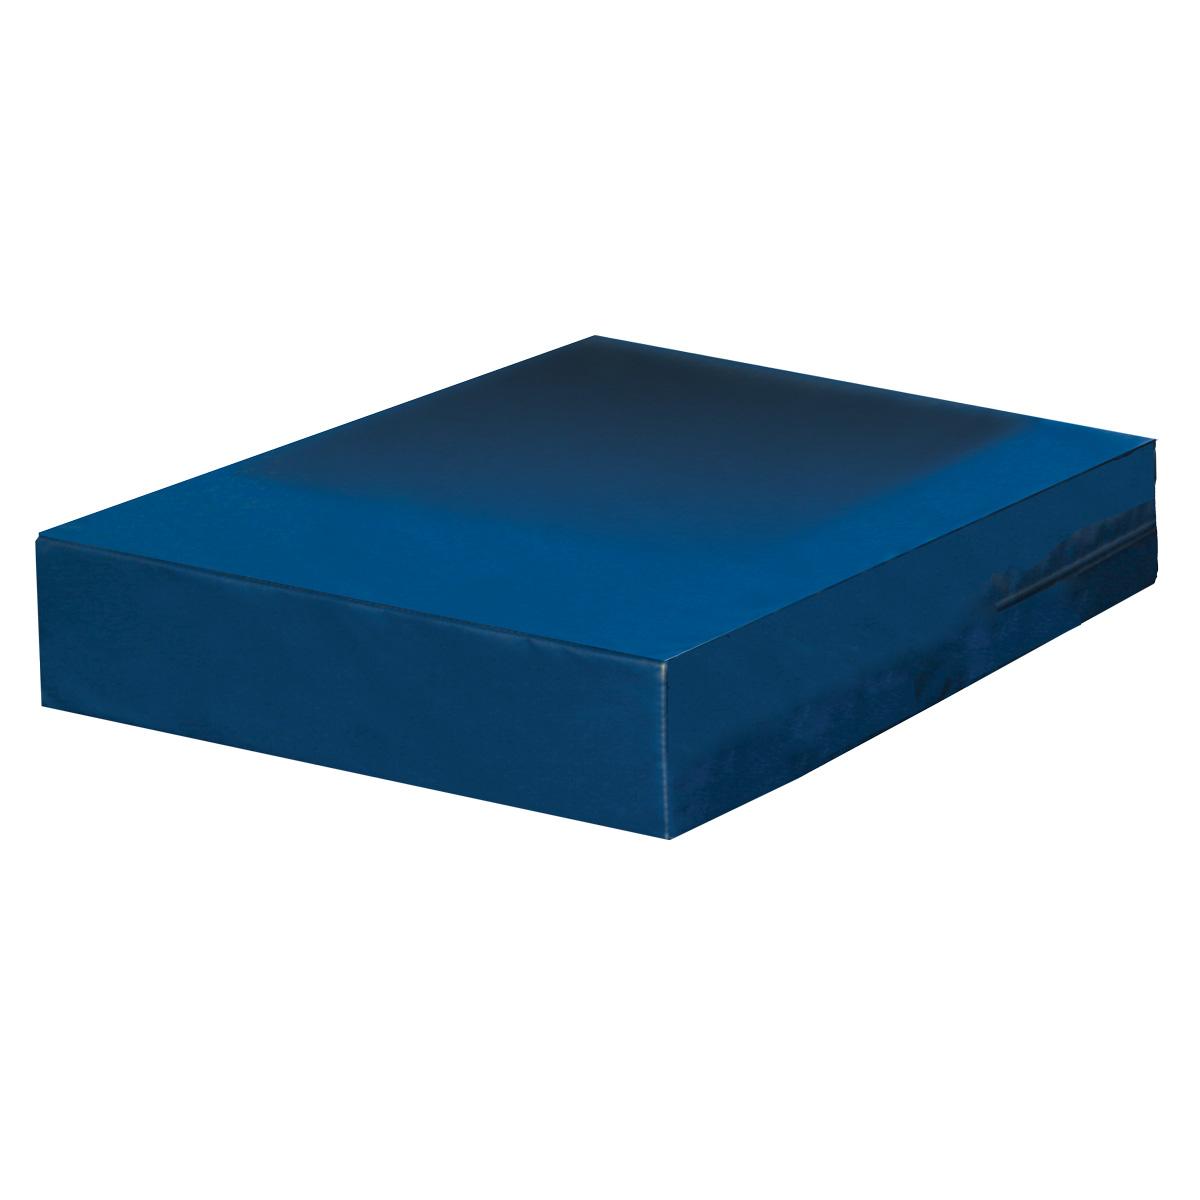 base block for mancino foam vault training table